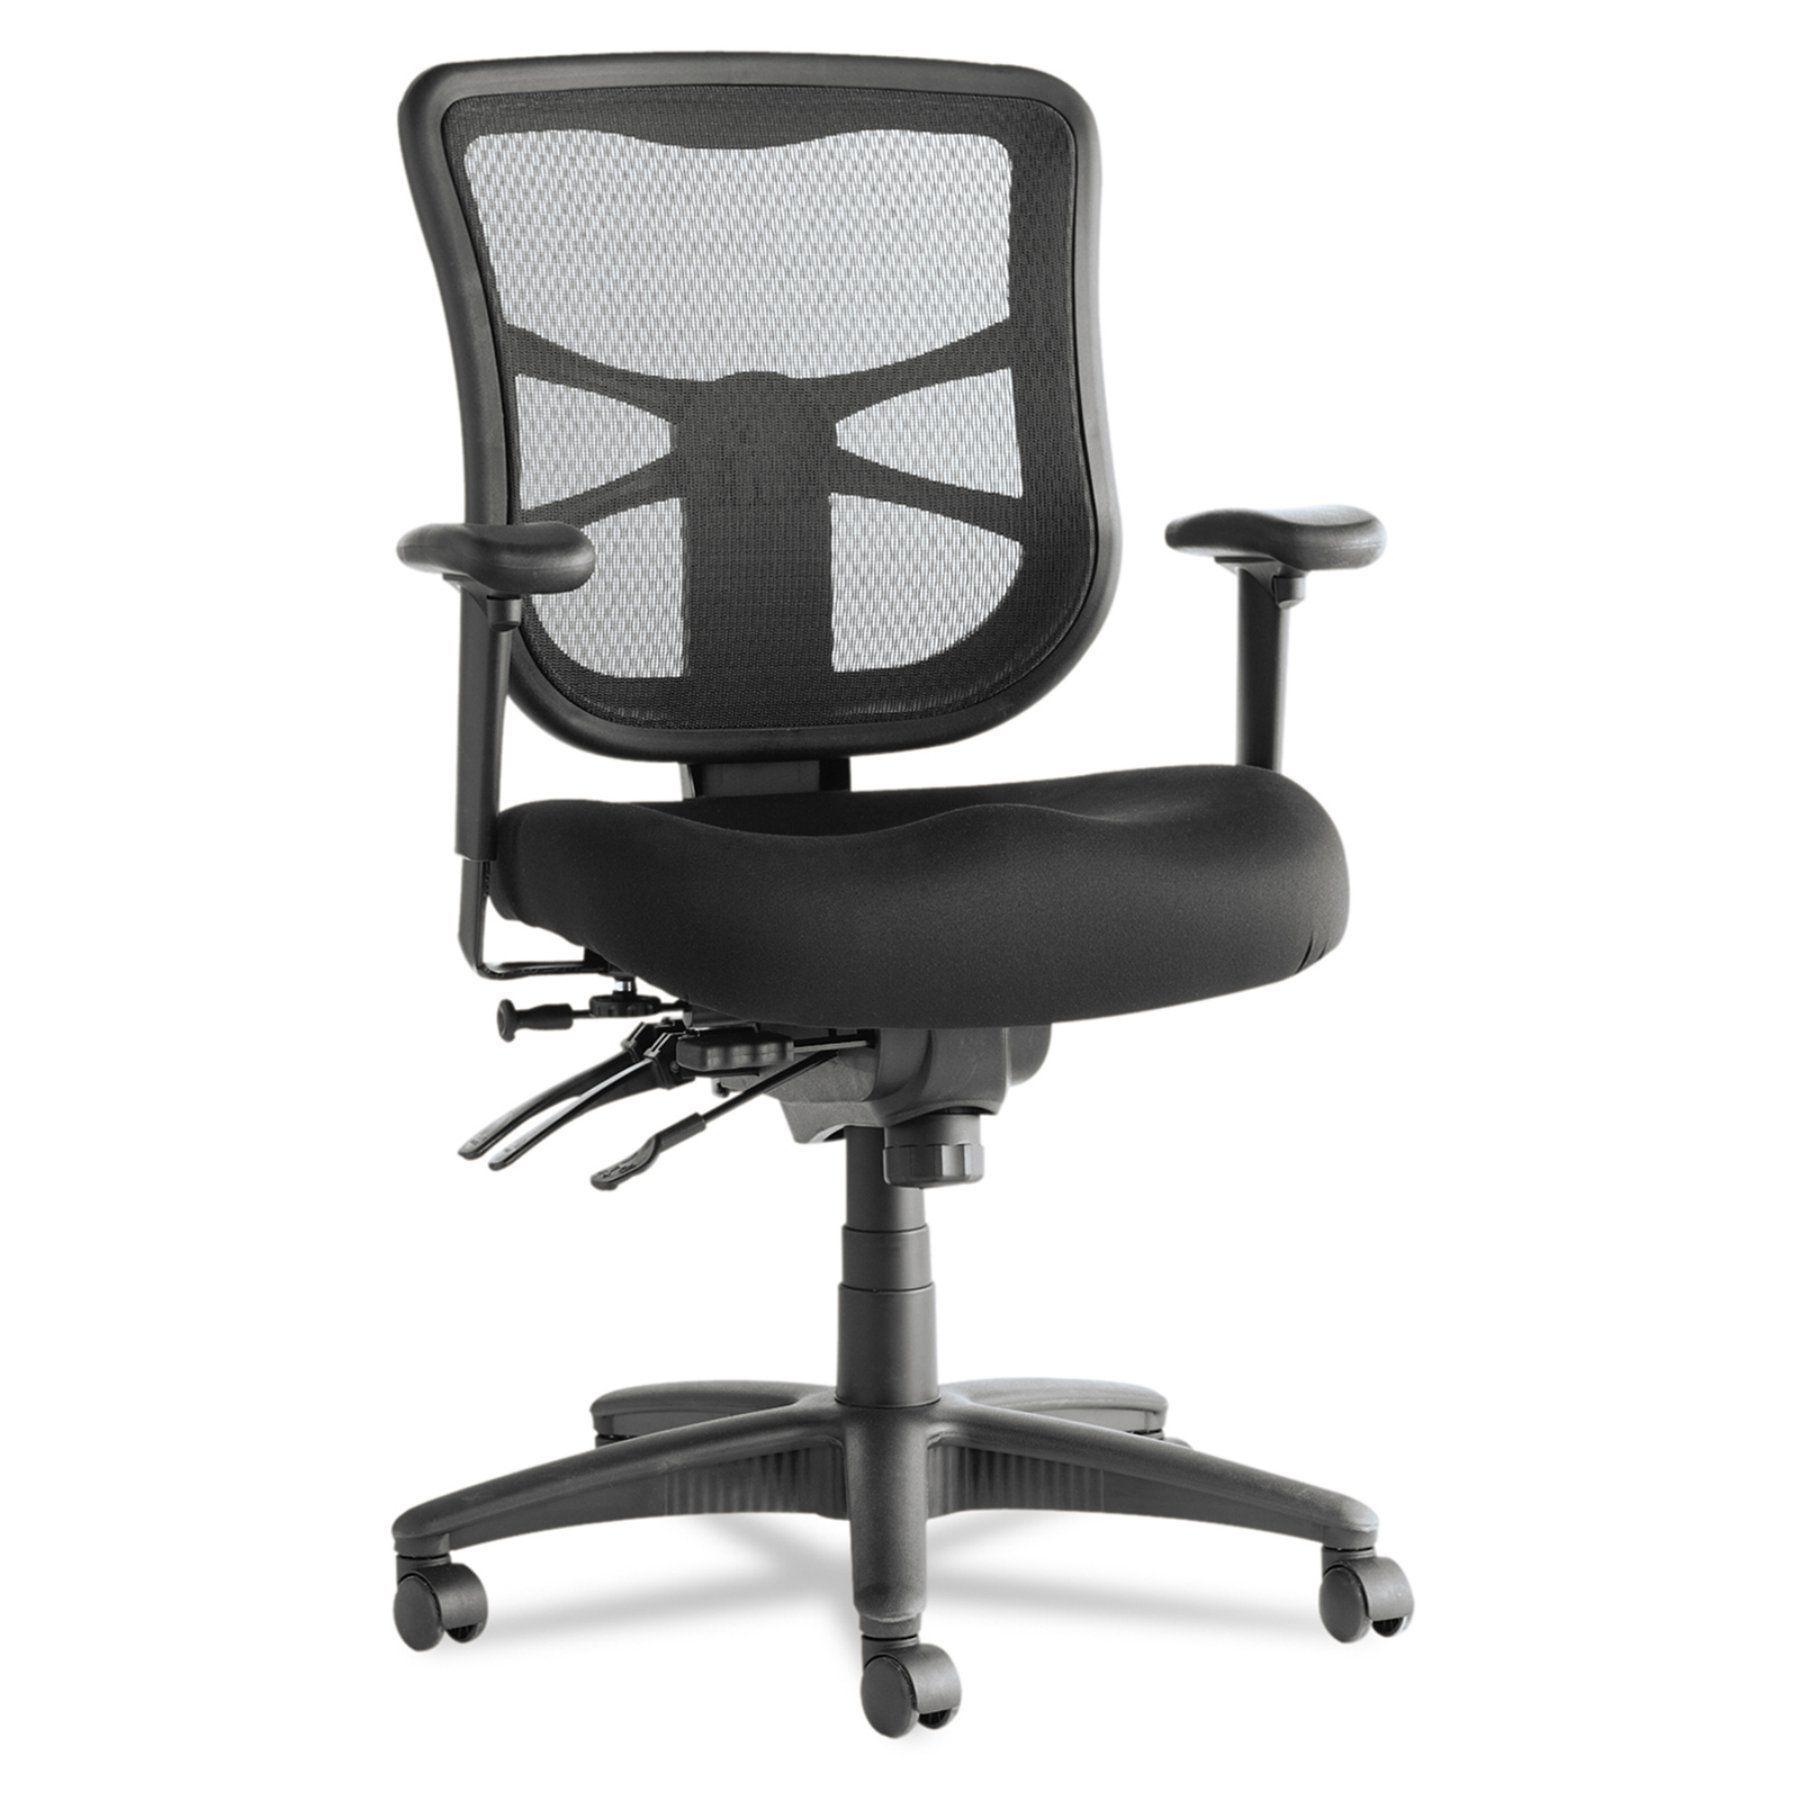 Alera Elusion Series Mesh Mid Back Multifunction Chair Black Alera Best Ergonomic Office Chair Chair